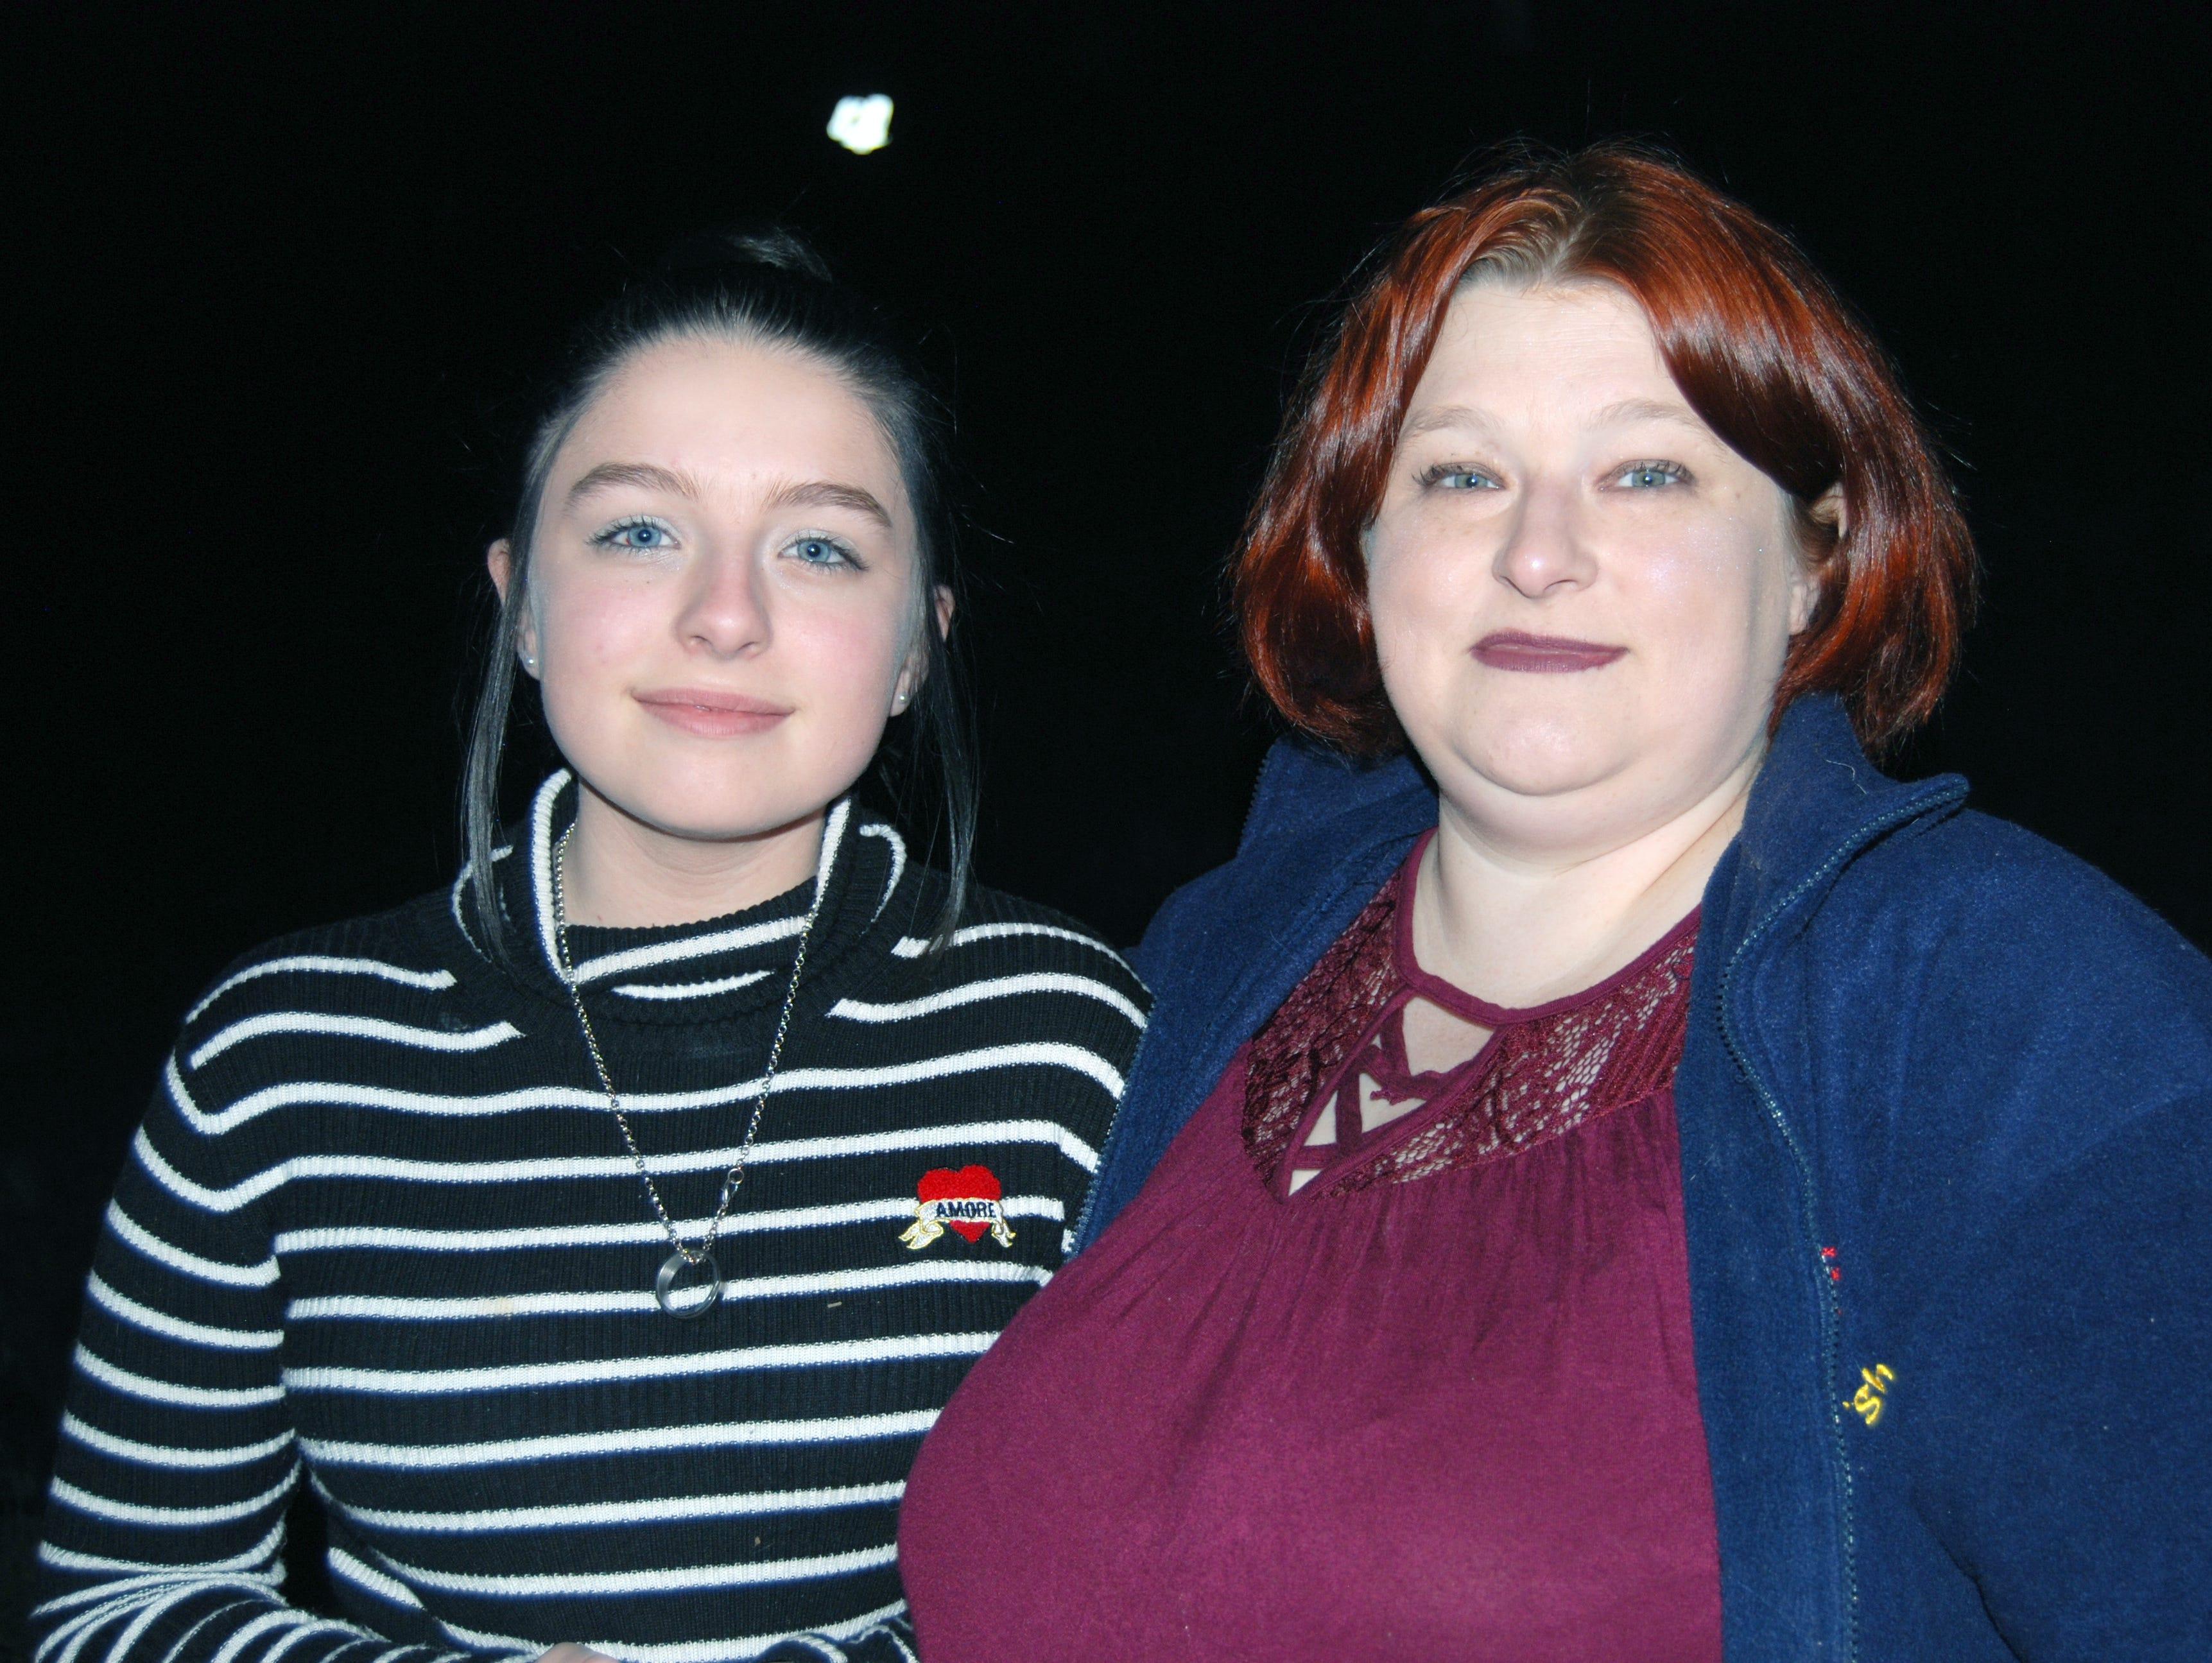 Ashley and Bridget Pamplin